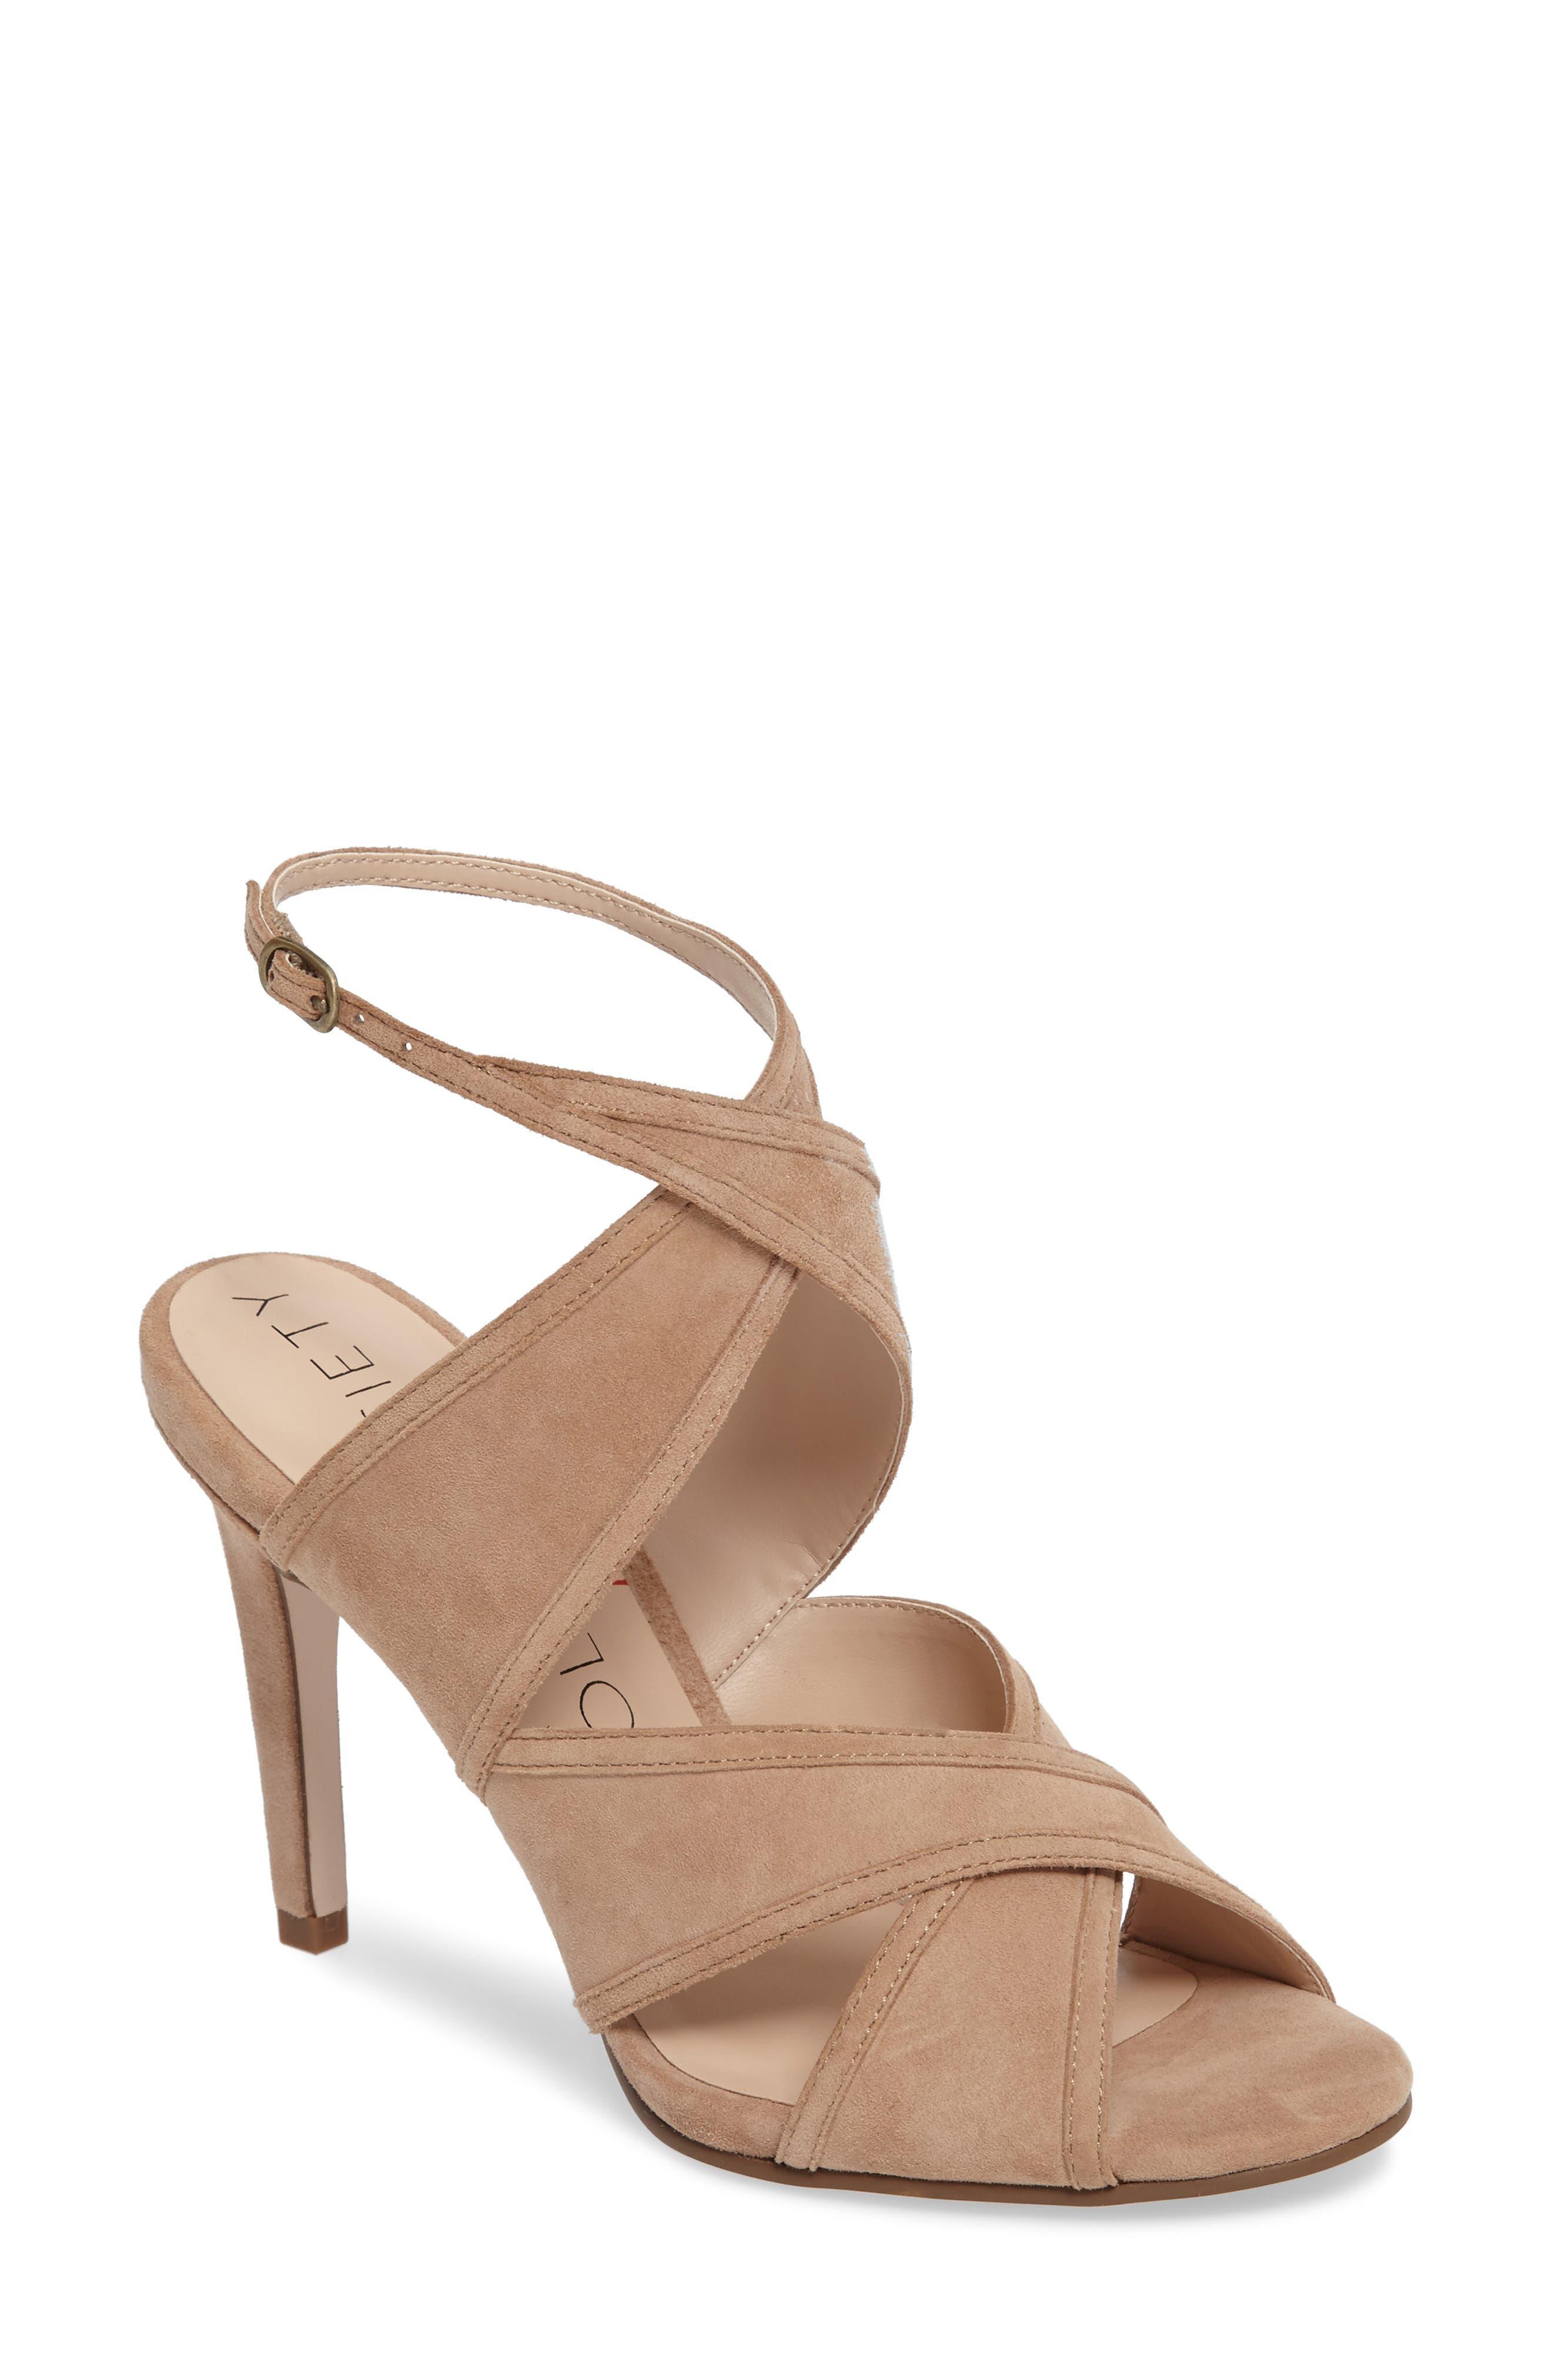 Esme Cross Strap Sandal,                         Main,                         color,